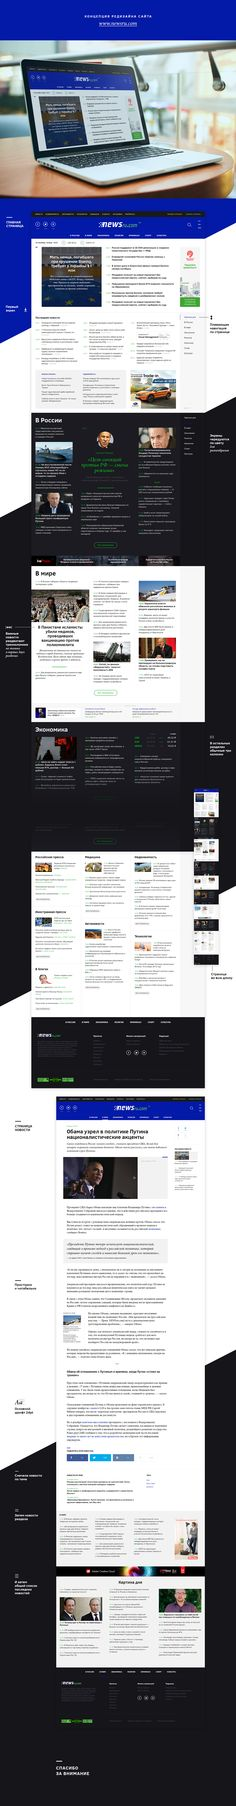 Концепт. Редизайн Newsru.com, Сайт © FilippLyakh